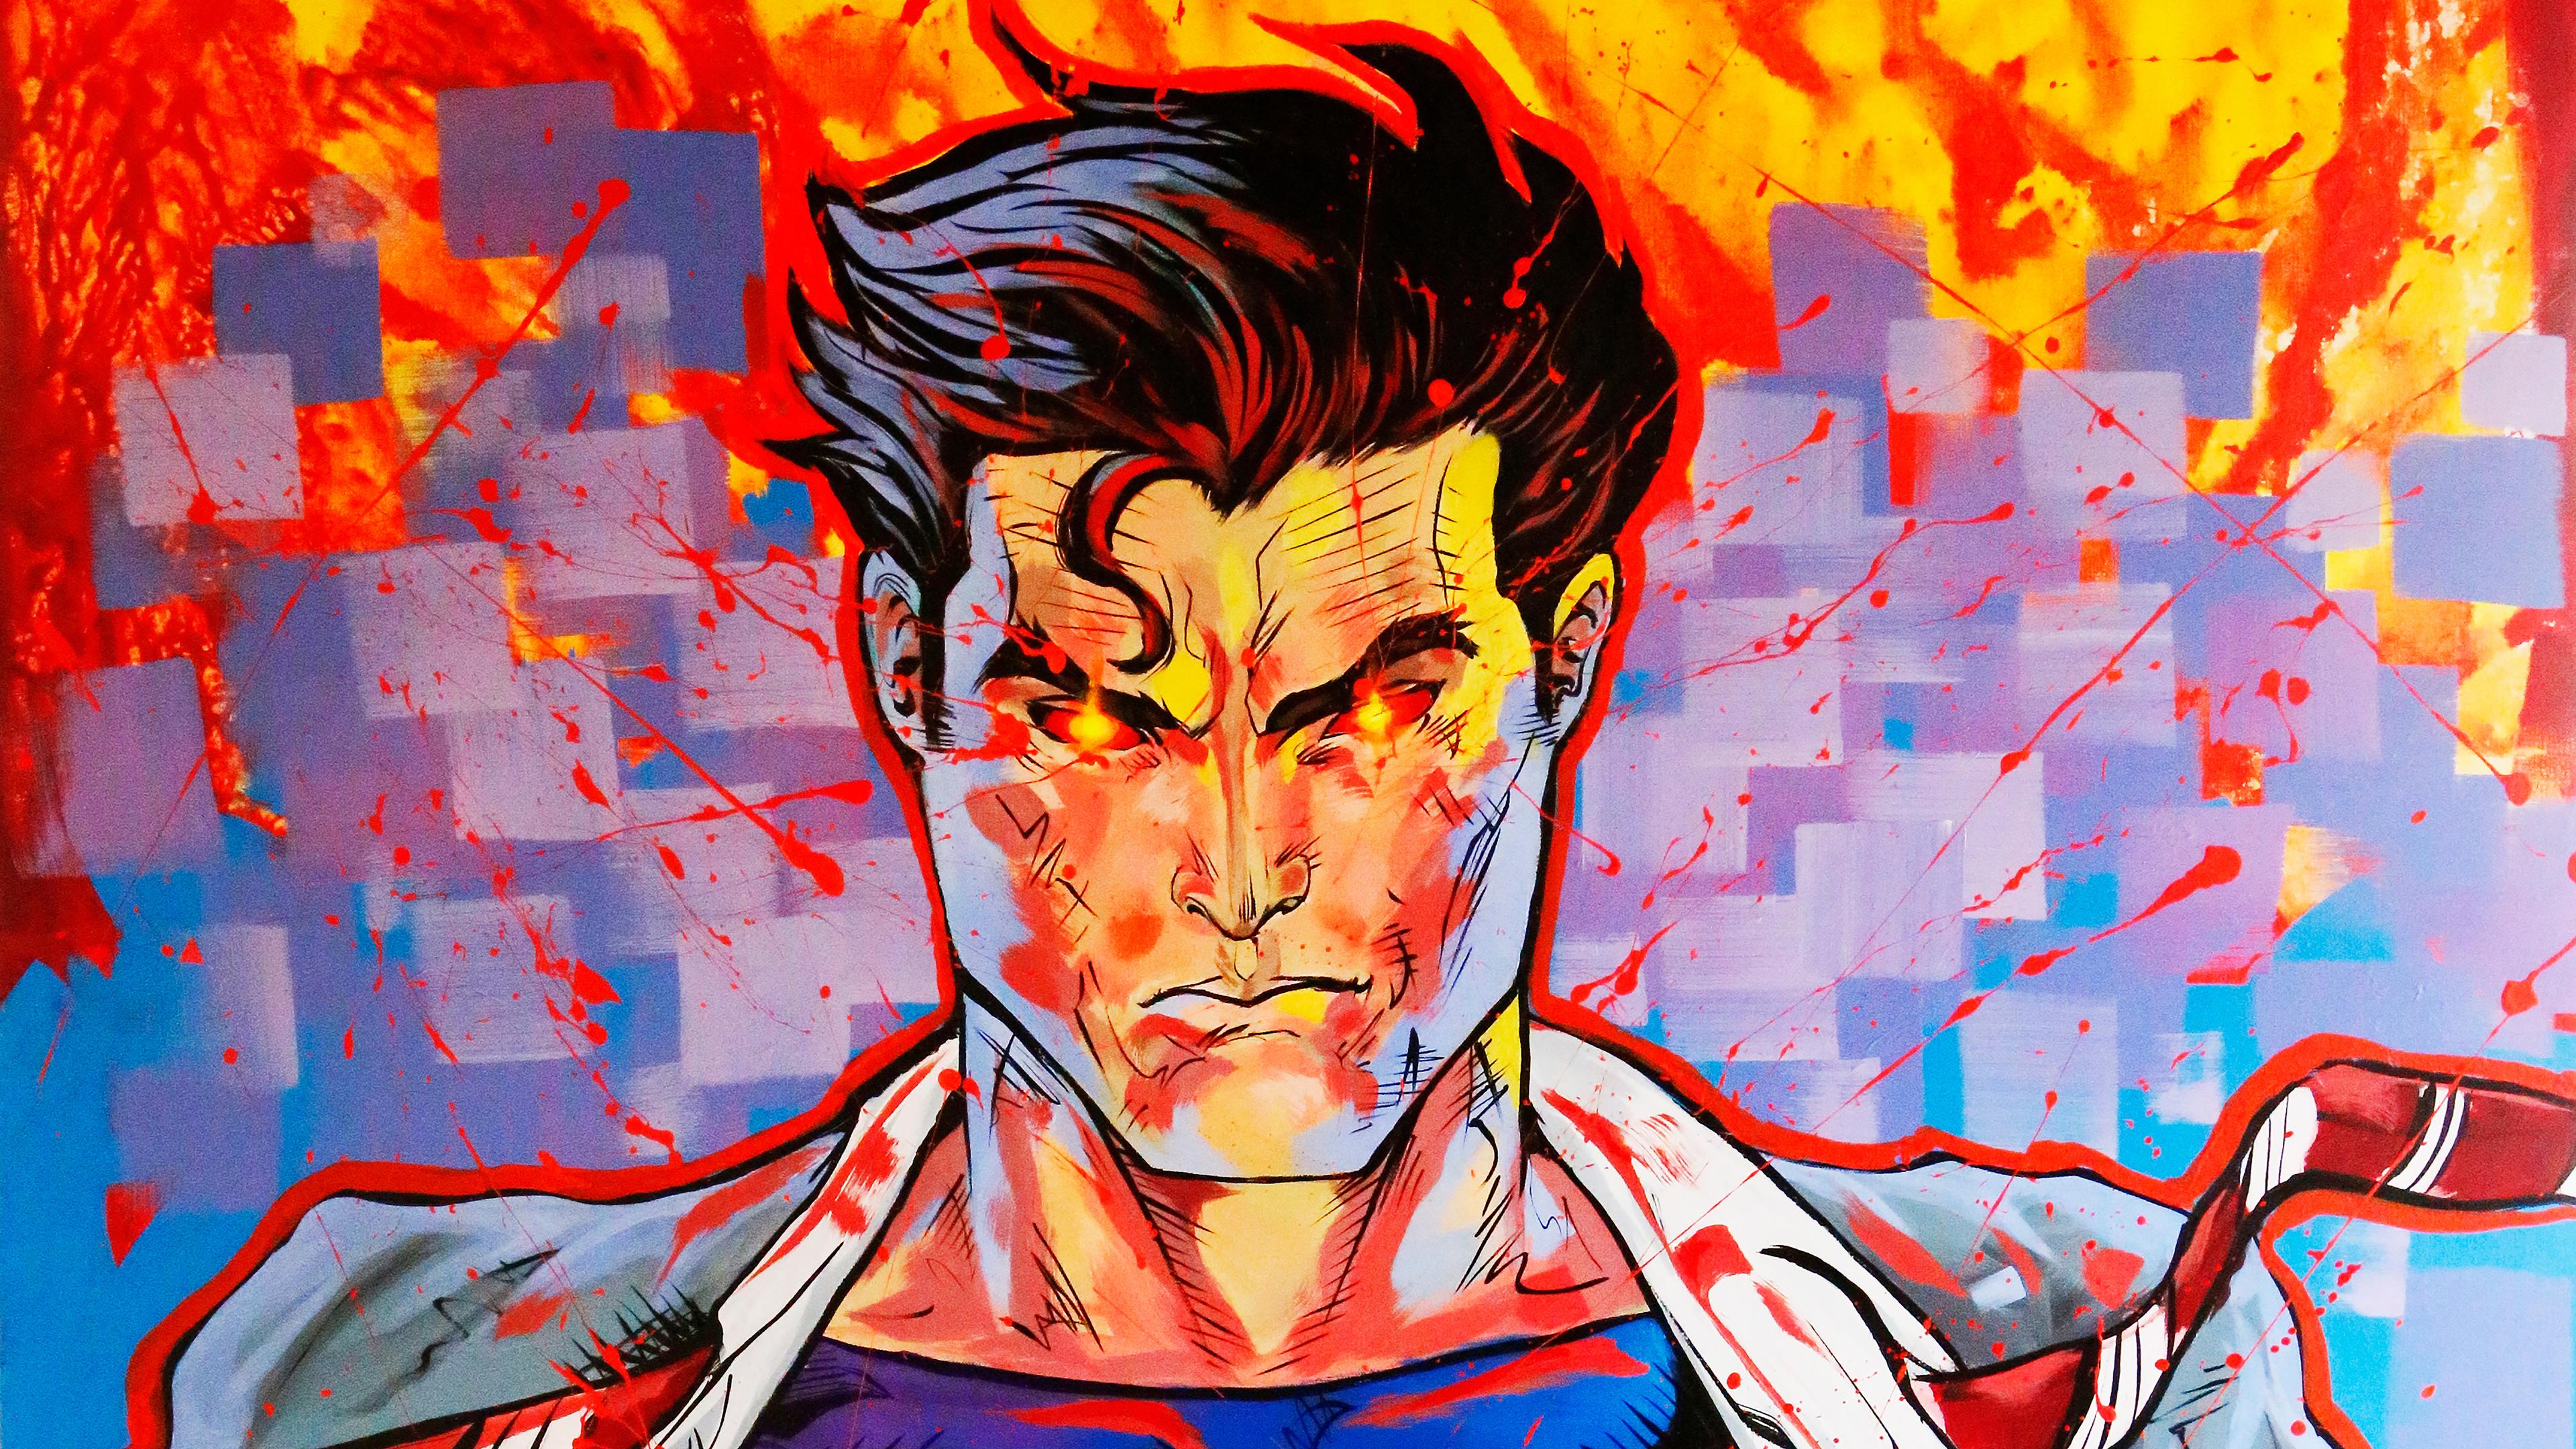 superman fire 4k 1547936621 - Superman Fire 4k - superman wallpapers, superheroes wallpapers, hd-wallpapers, digital art wallpapers, artwork wallpapers, artist wallpapers, 5k wallpapers, 4k-wallpapers